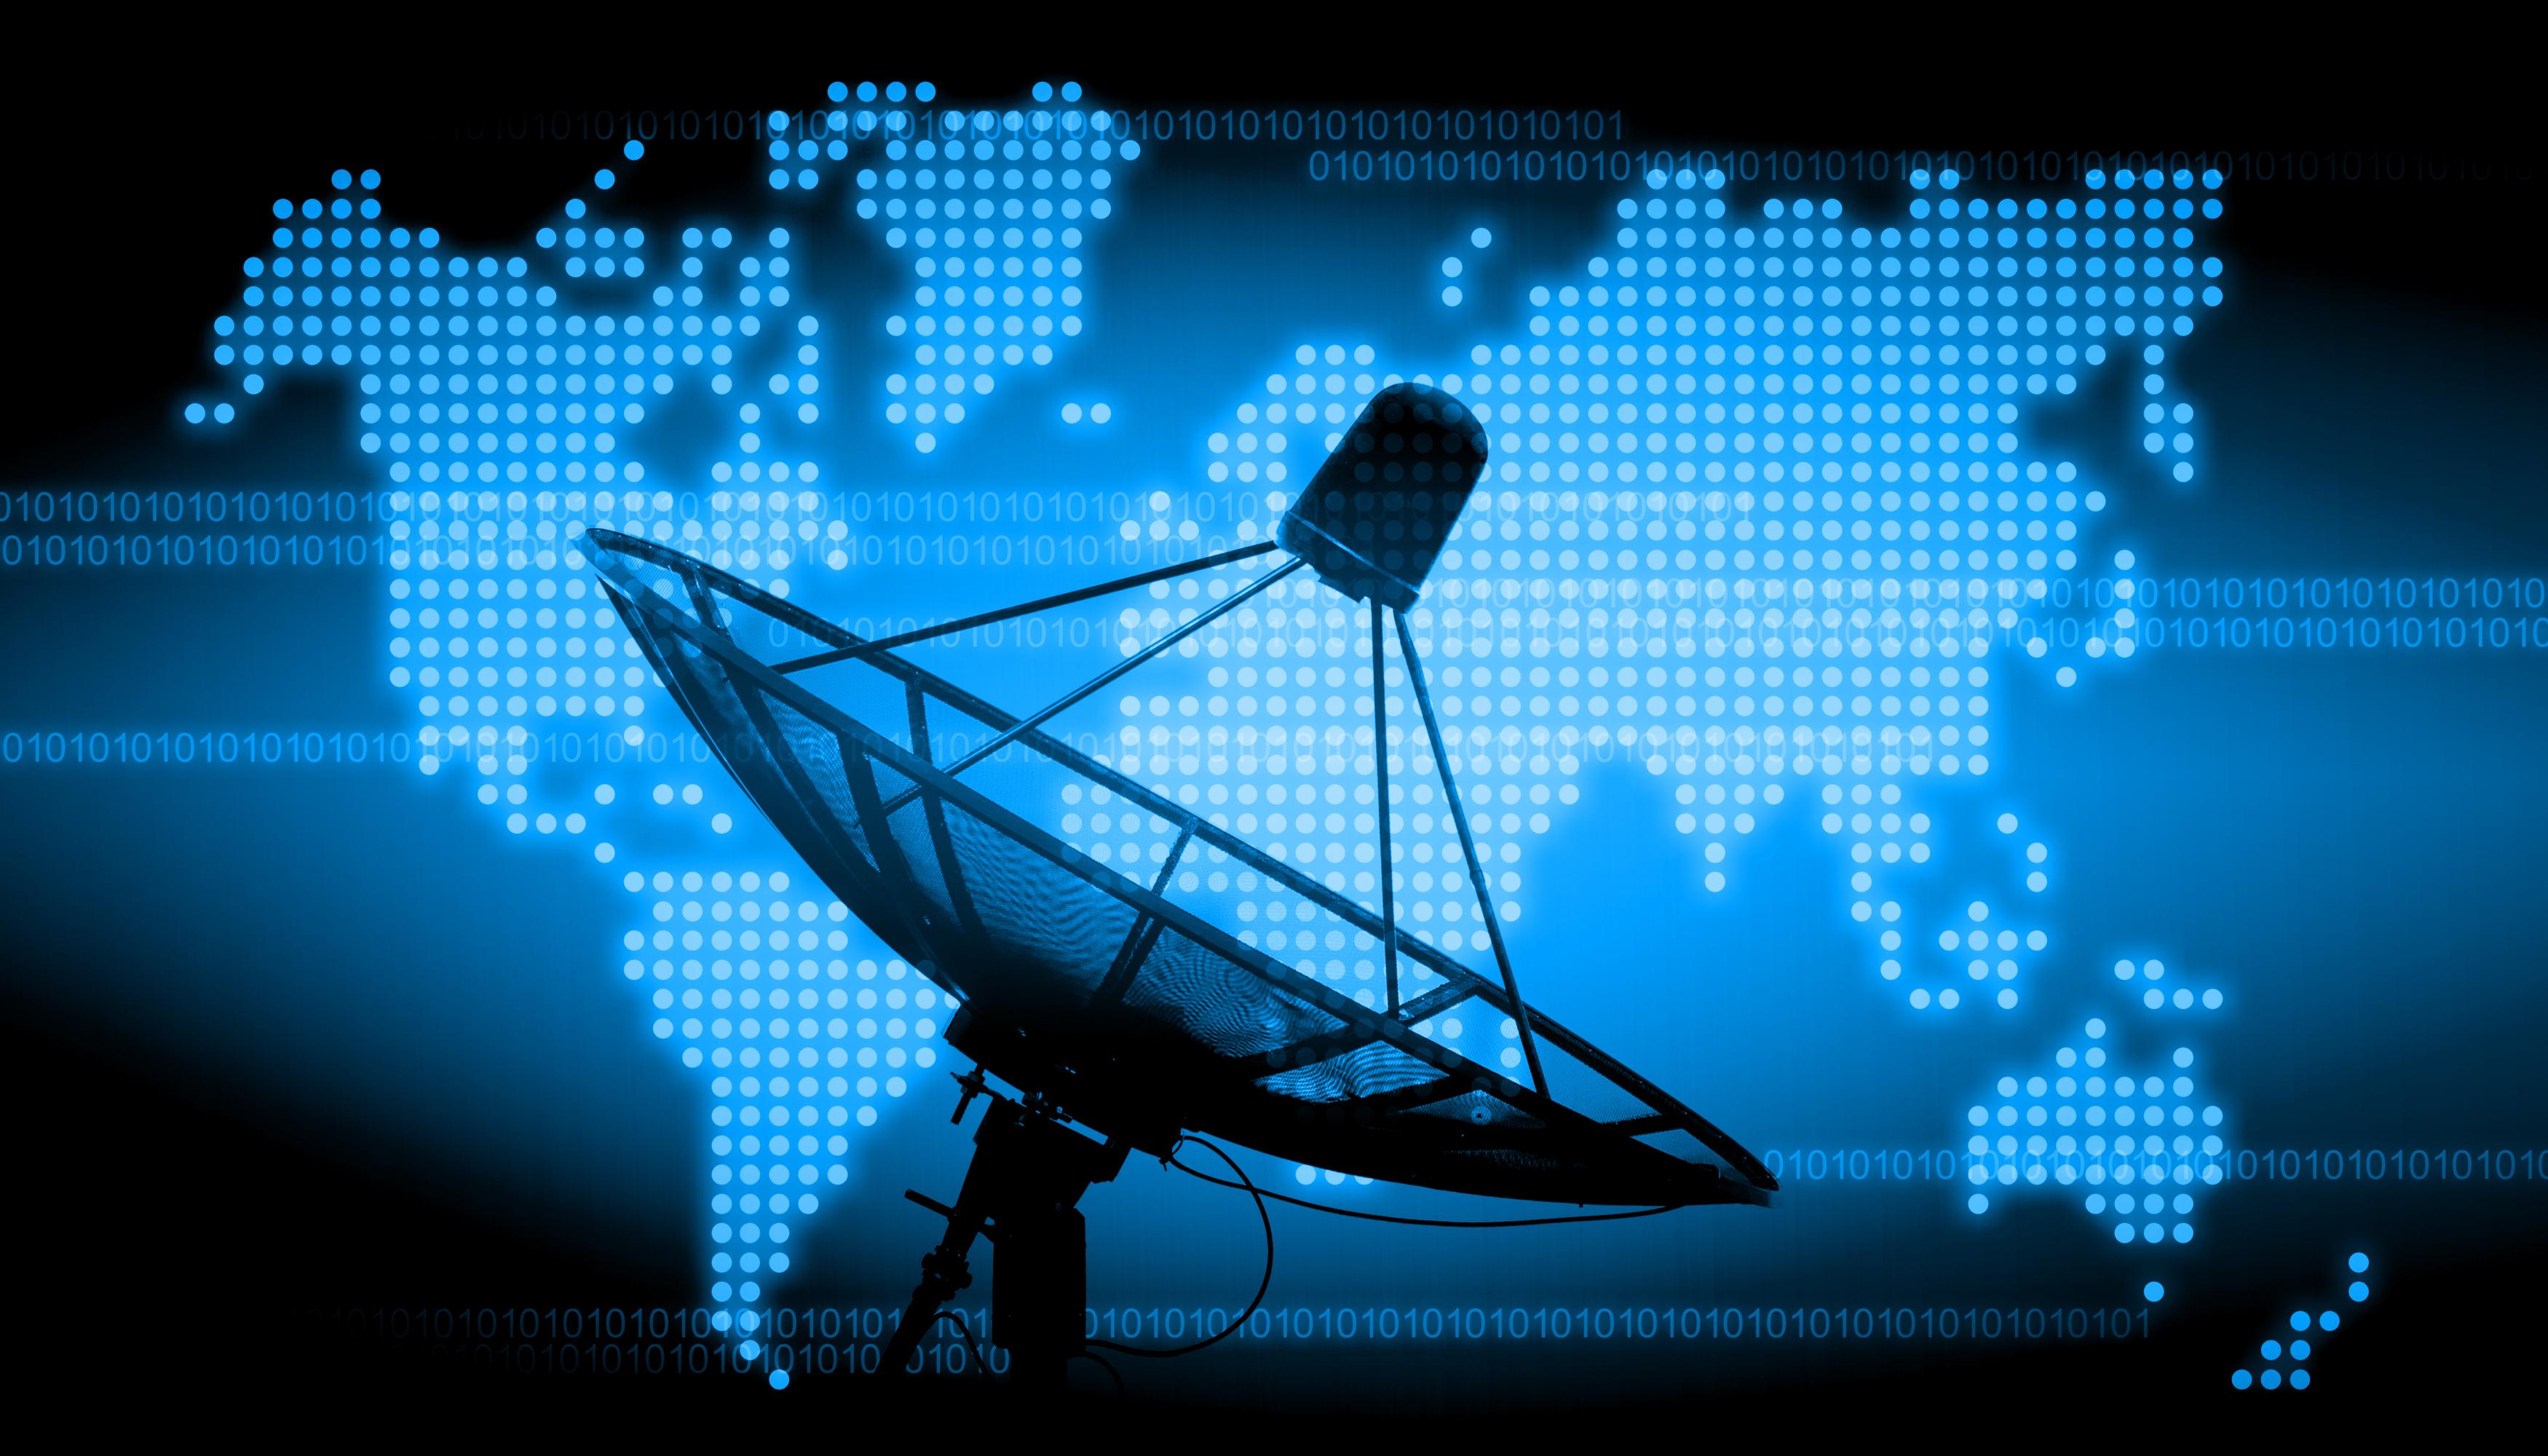 DEP30013 COMMUNICATION SYSTEM FUNDAMENTALS